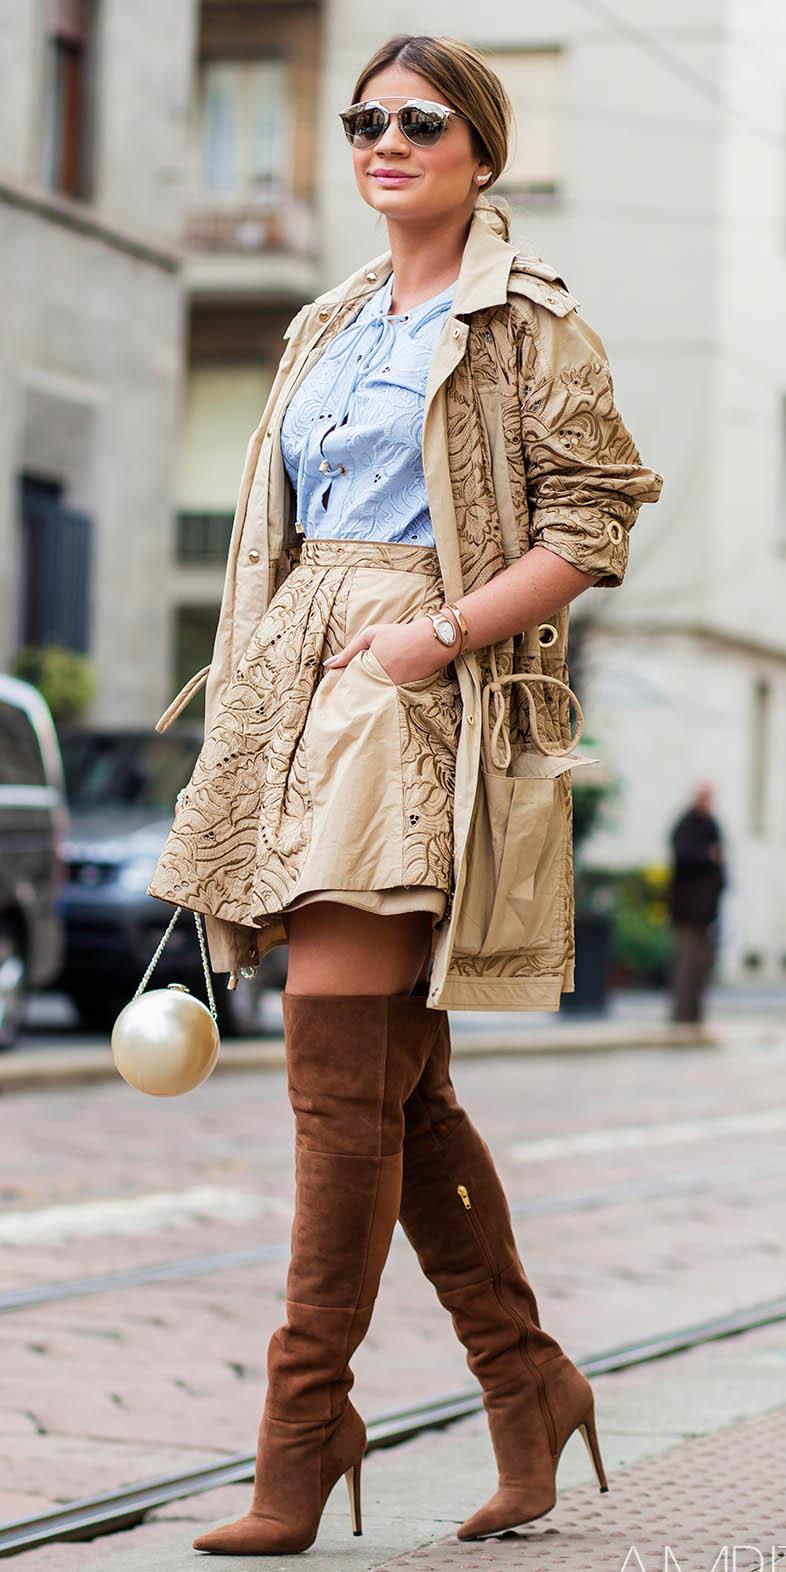 tan-mini-skirt-blue-light-collared-shirt-tan-jacket-utility-brown-shoe-boots-otk-sun-pony-fall-winter-hairr-lunch.jpg